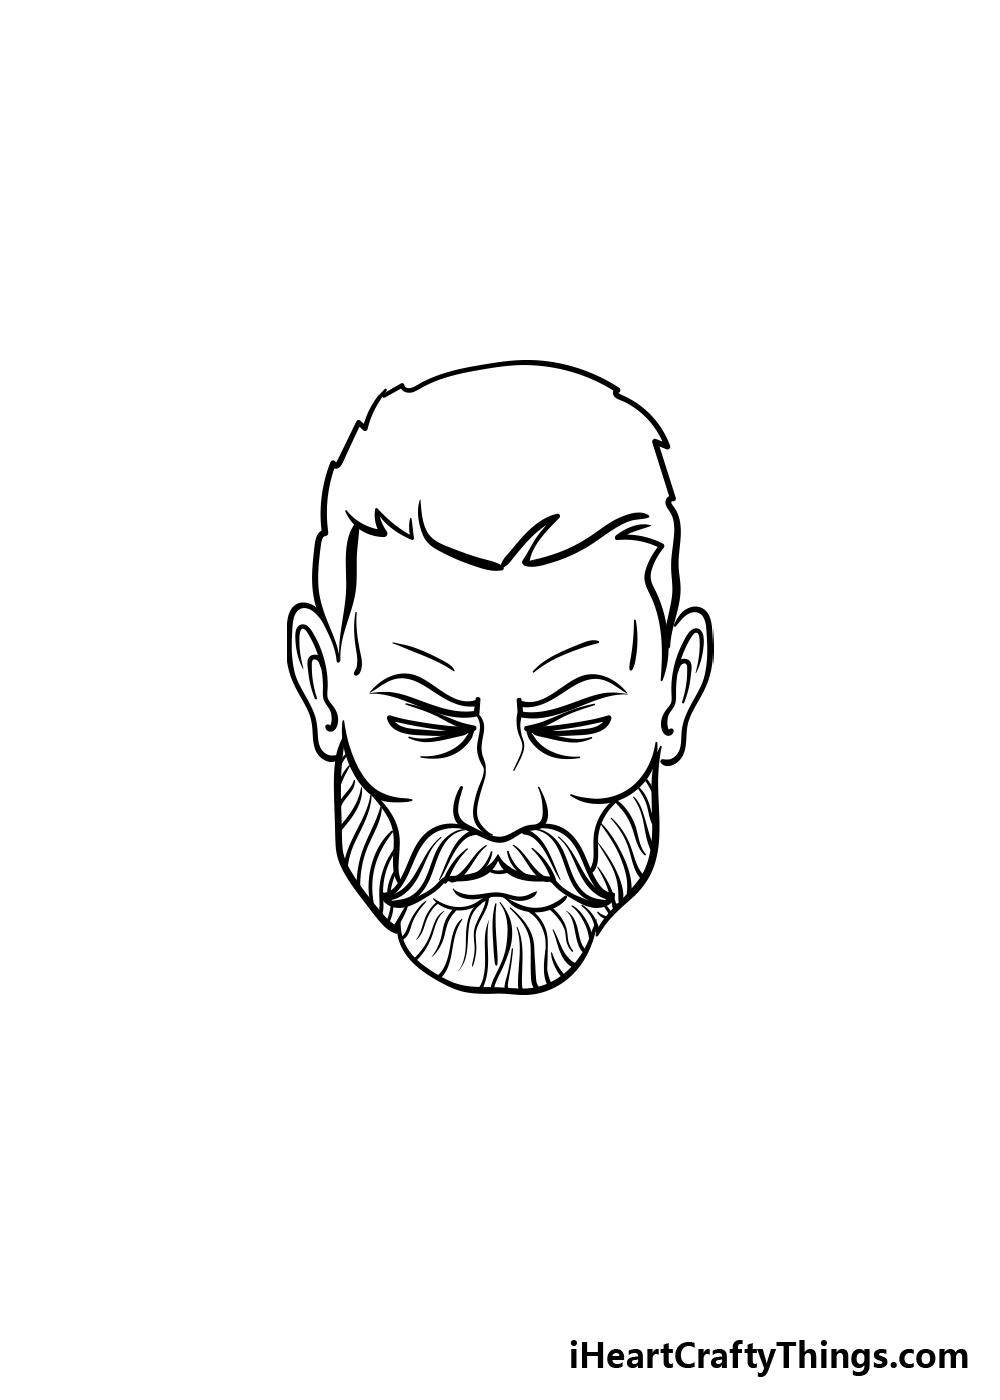 drawing a beard step 4